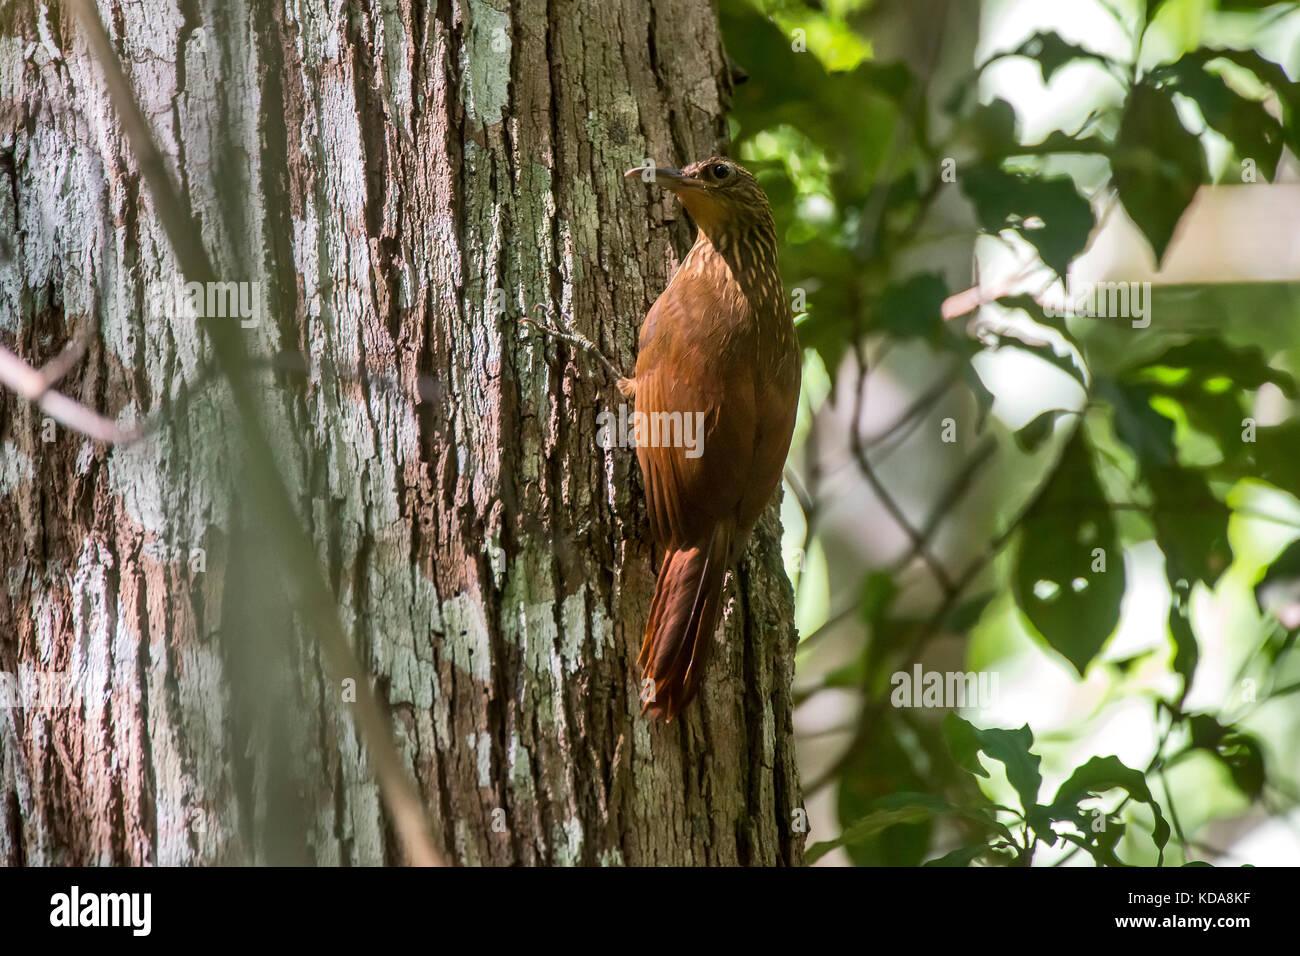 """Arapaçu-de-garganta-amarela (Xiphorhynchus guttatus) fotografado em Linhares, Espírito Santo -  Sudeste do Brasil. Stock Photo"